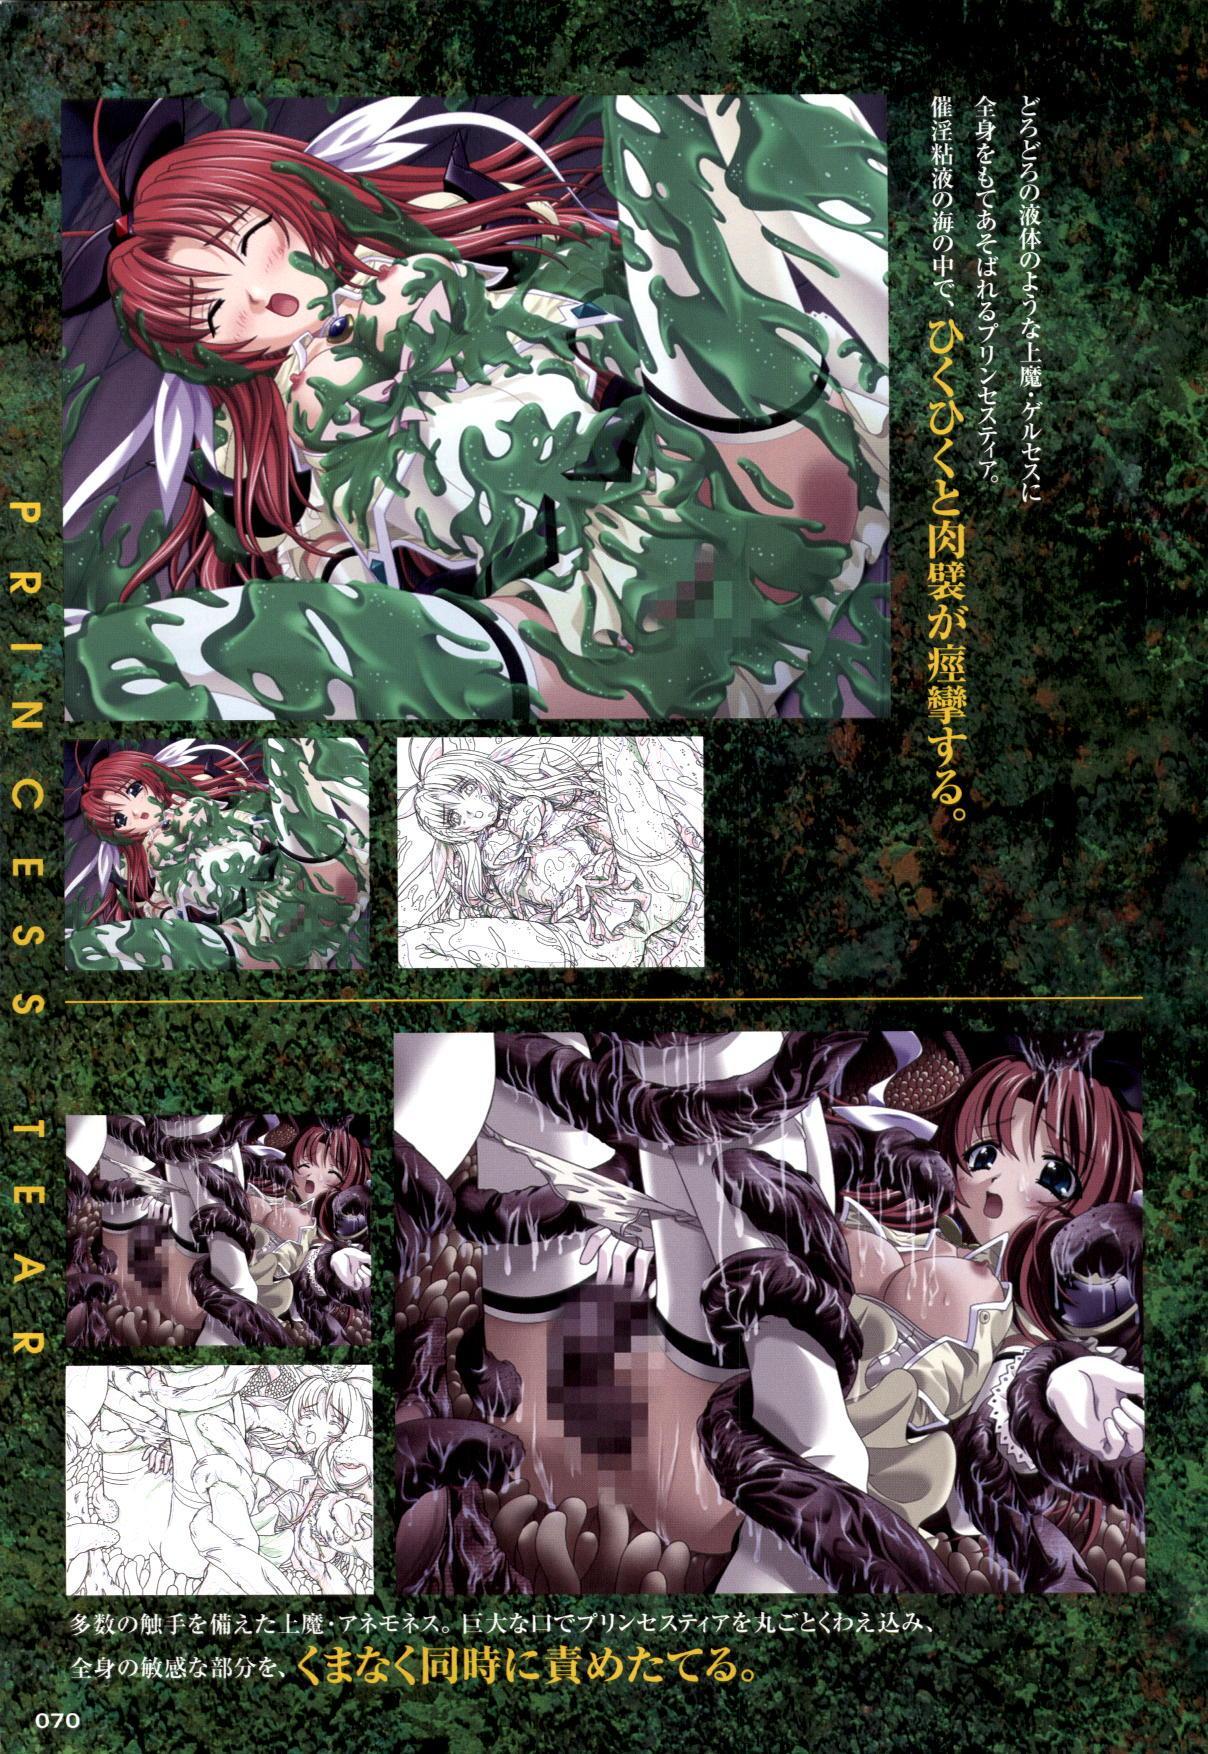 Mahou Senshi Sweet Knight & Mahou Senshi Princess Tear 69